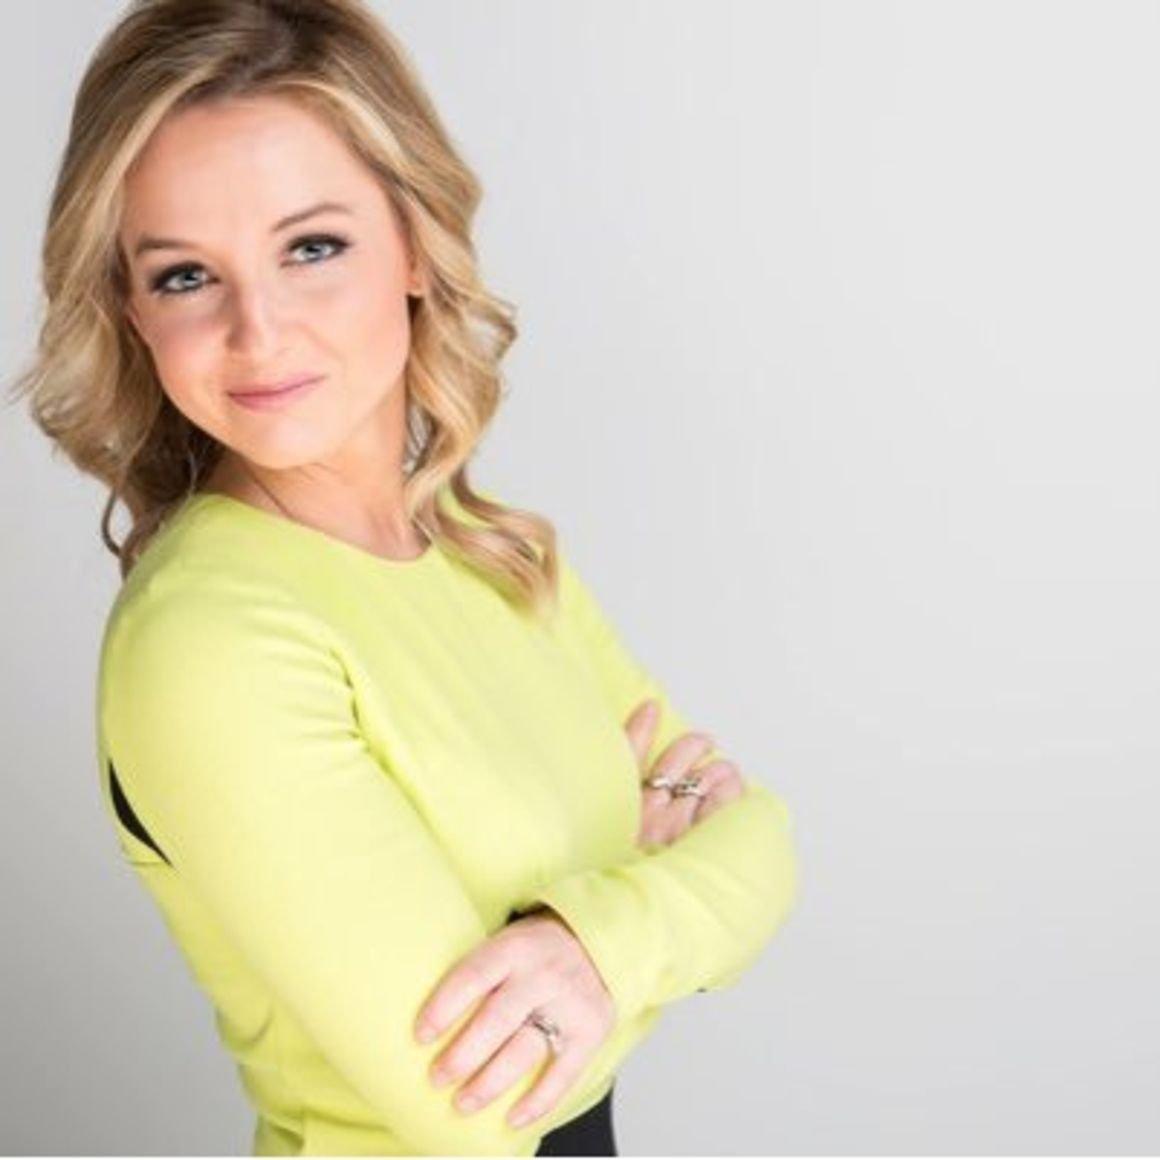 Herscher grad pays her dues, breaks into Chicago media market